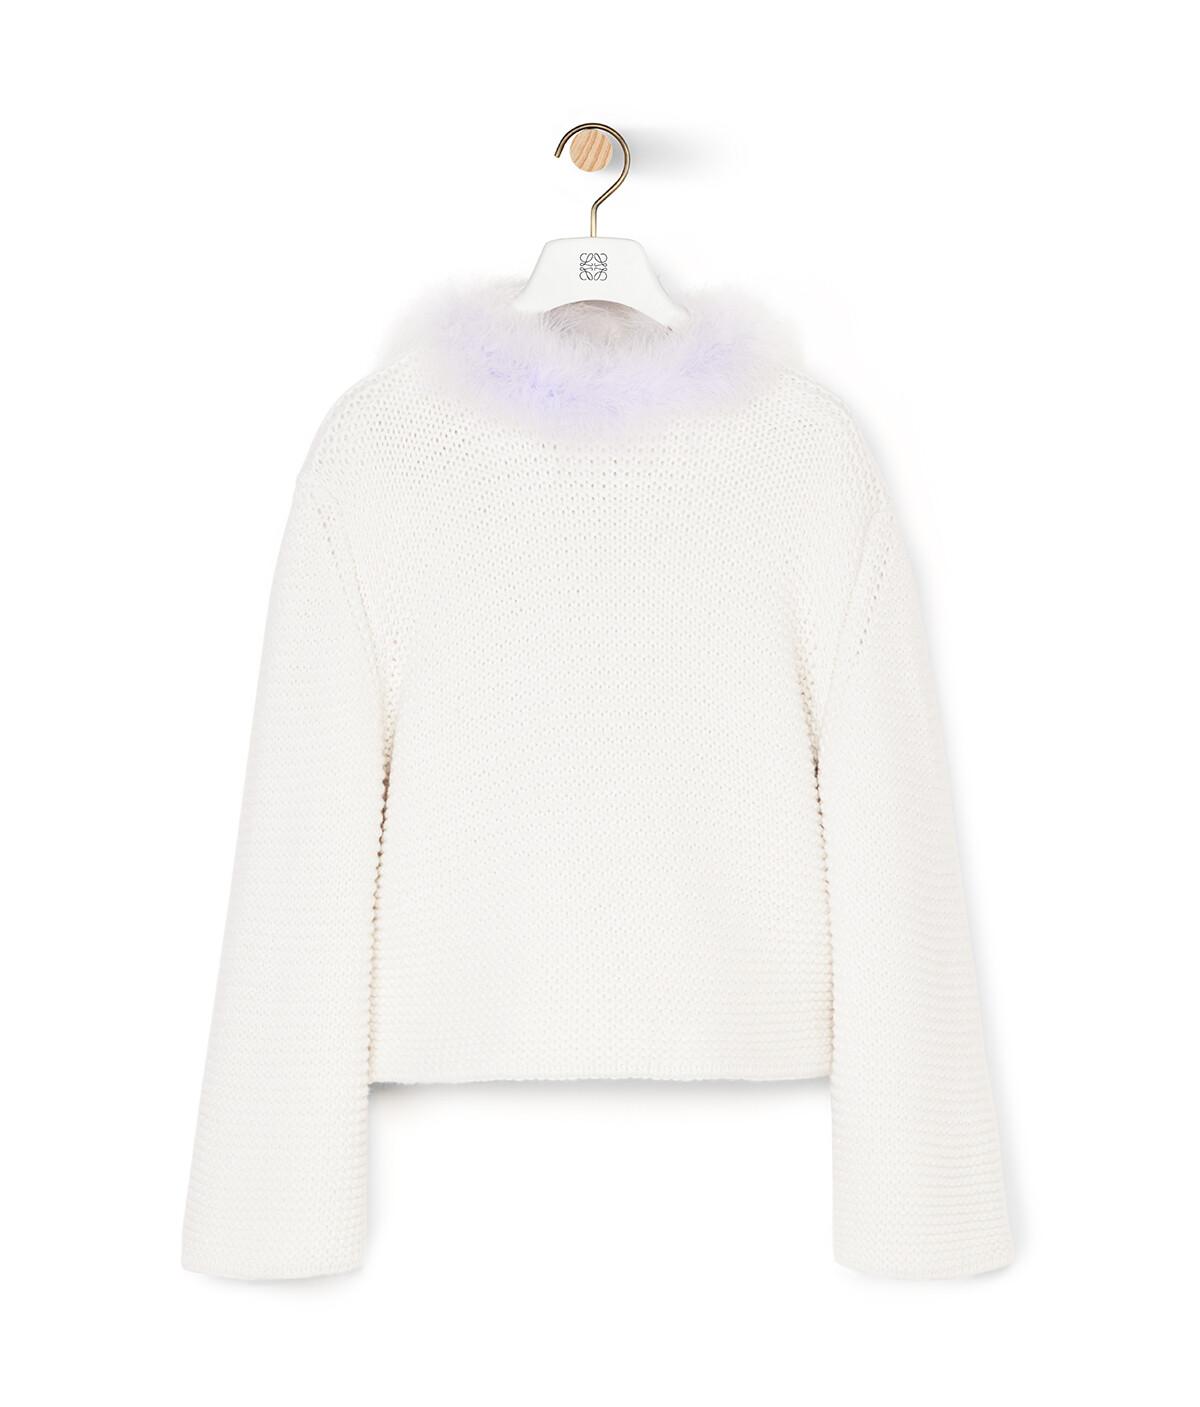 LOEWE Feather Trim Sweater Blanco/Morado front